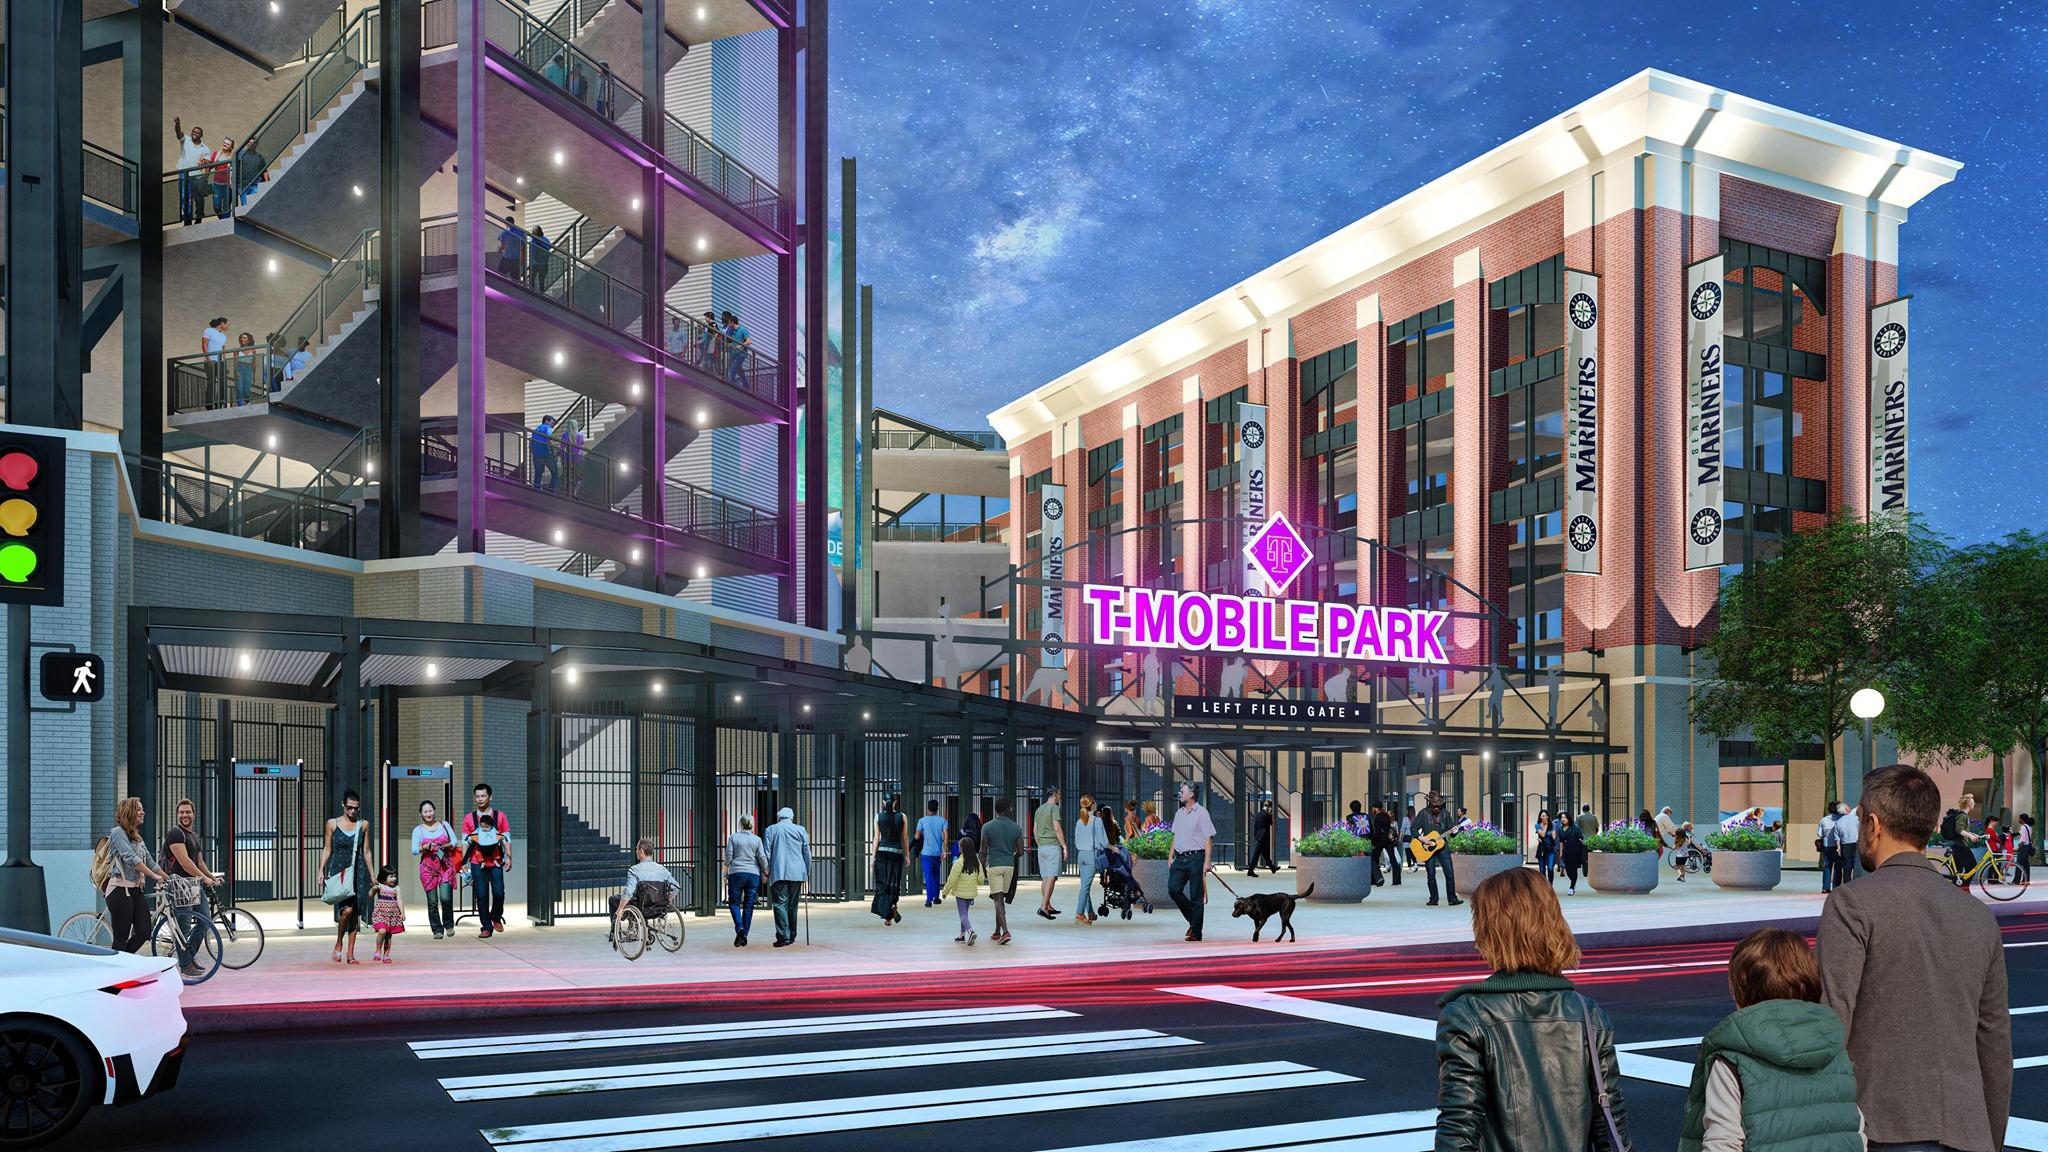 Mariners' $30 Million T-Mobile Park Upgrades